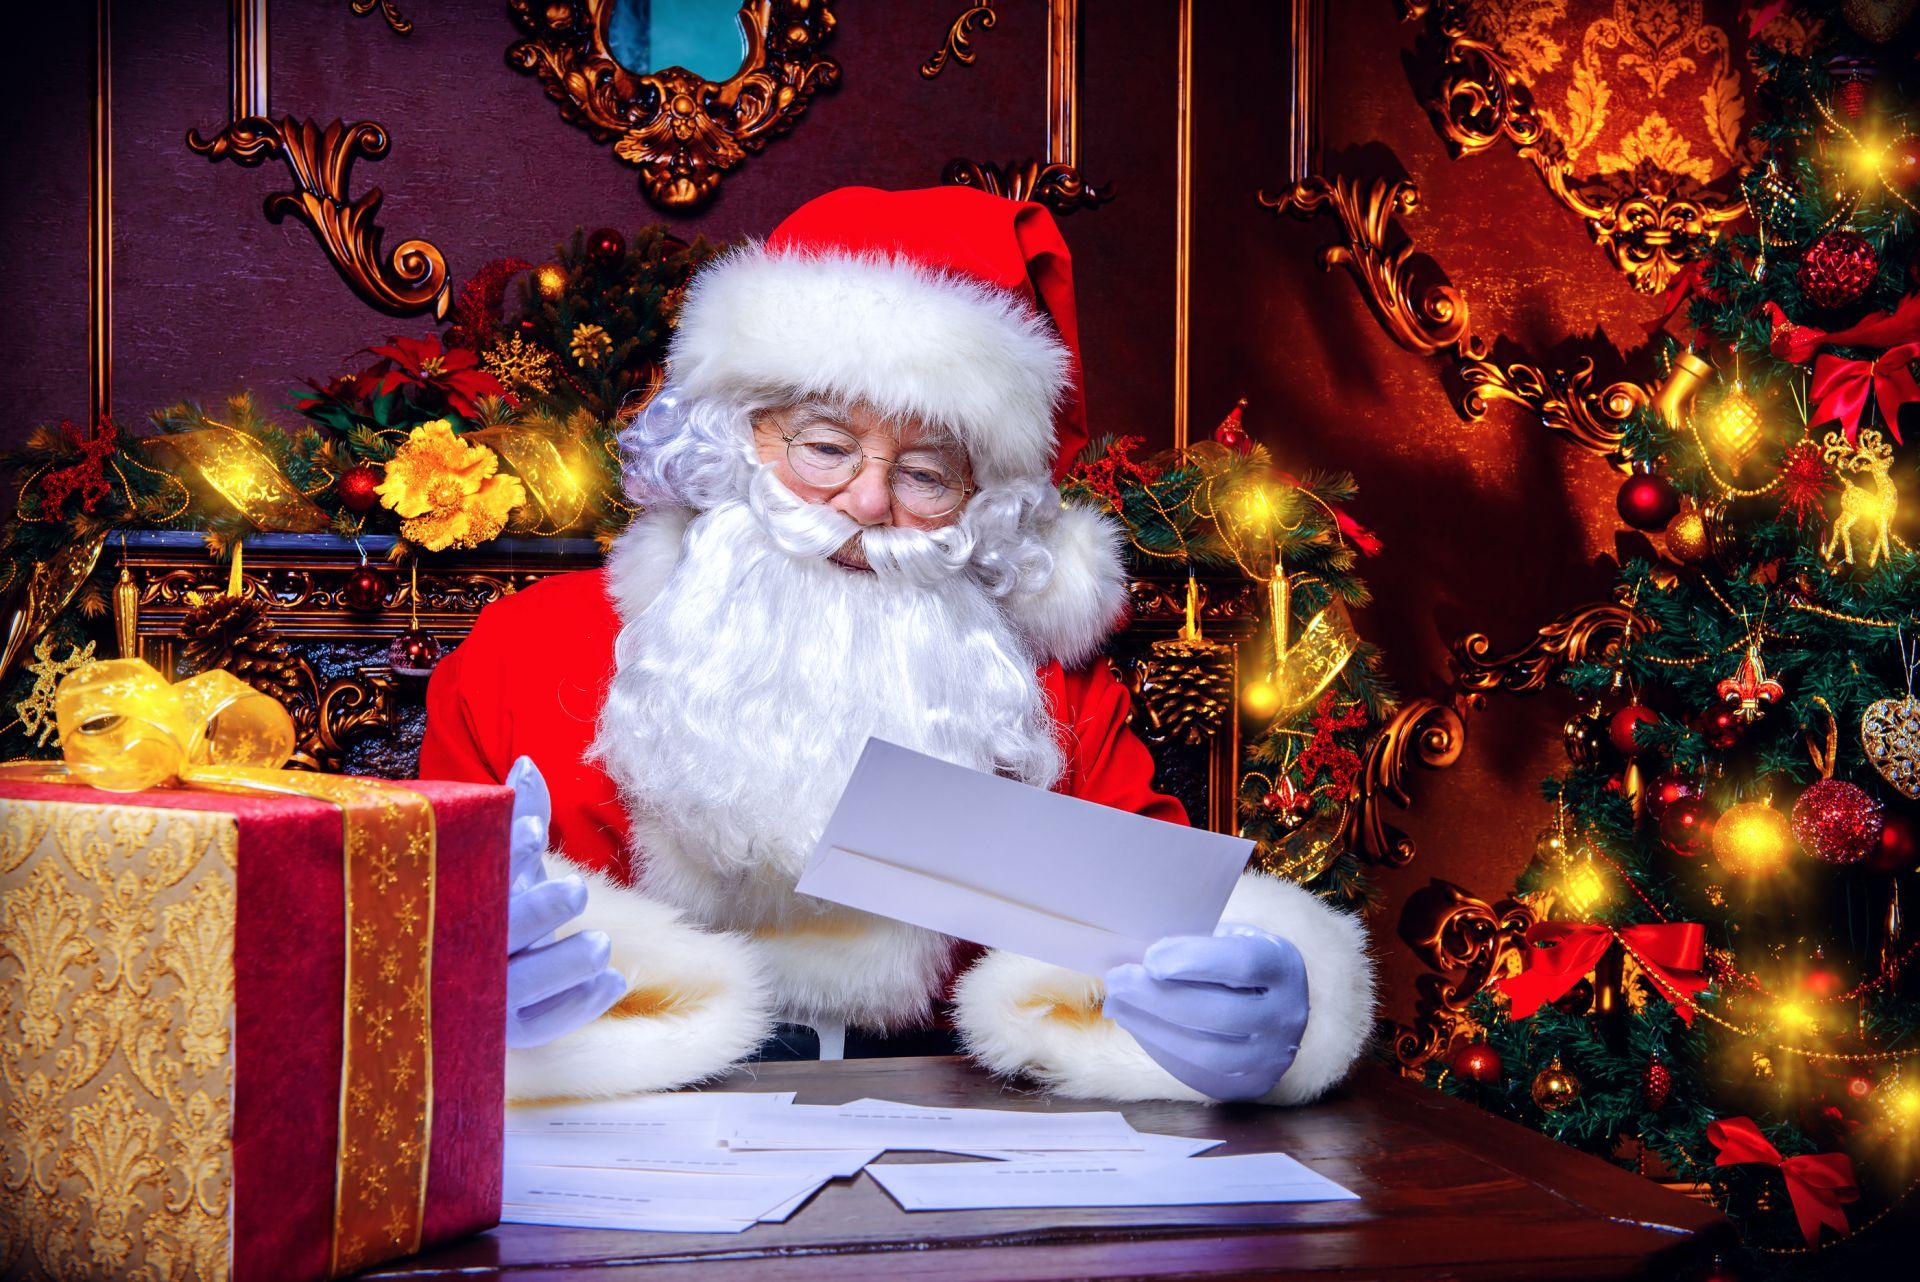 Foto de Carta-resposta do Papai Noel